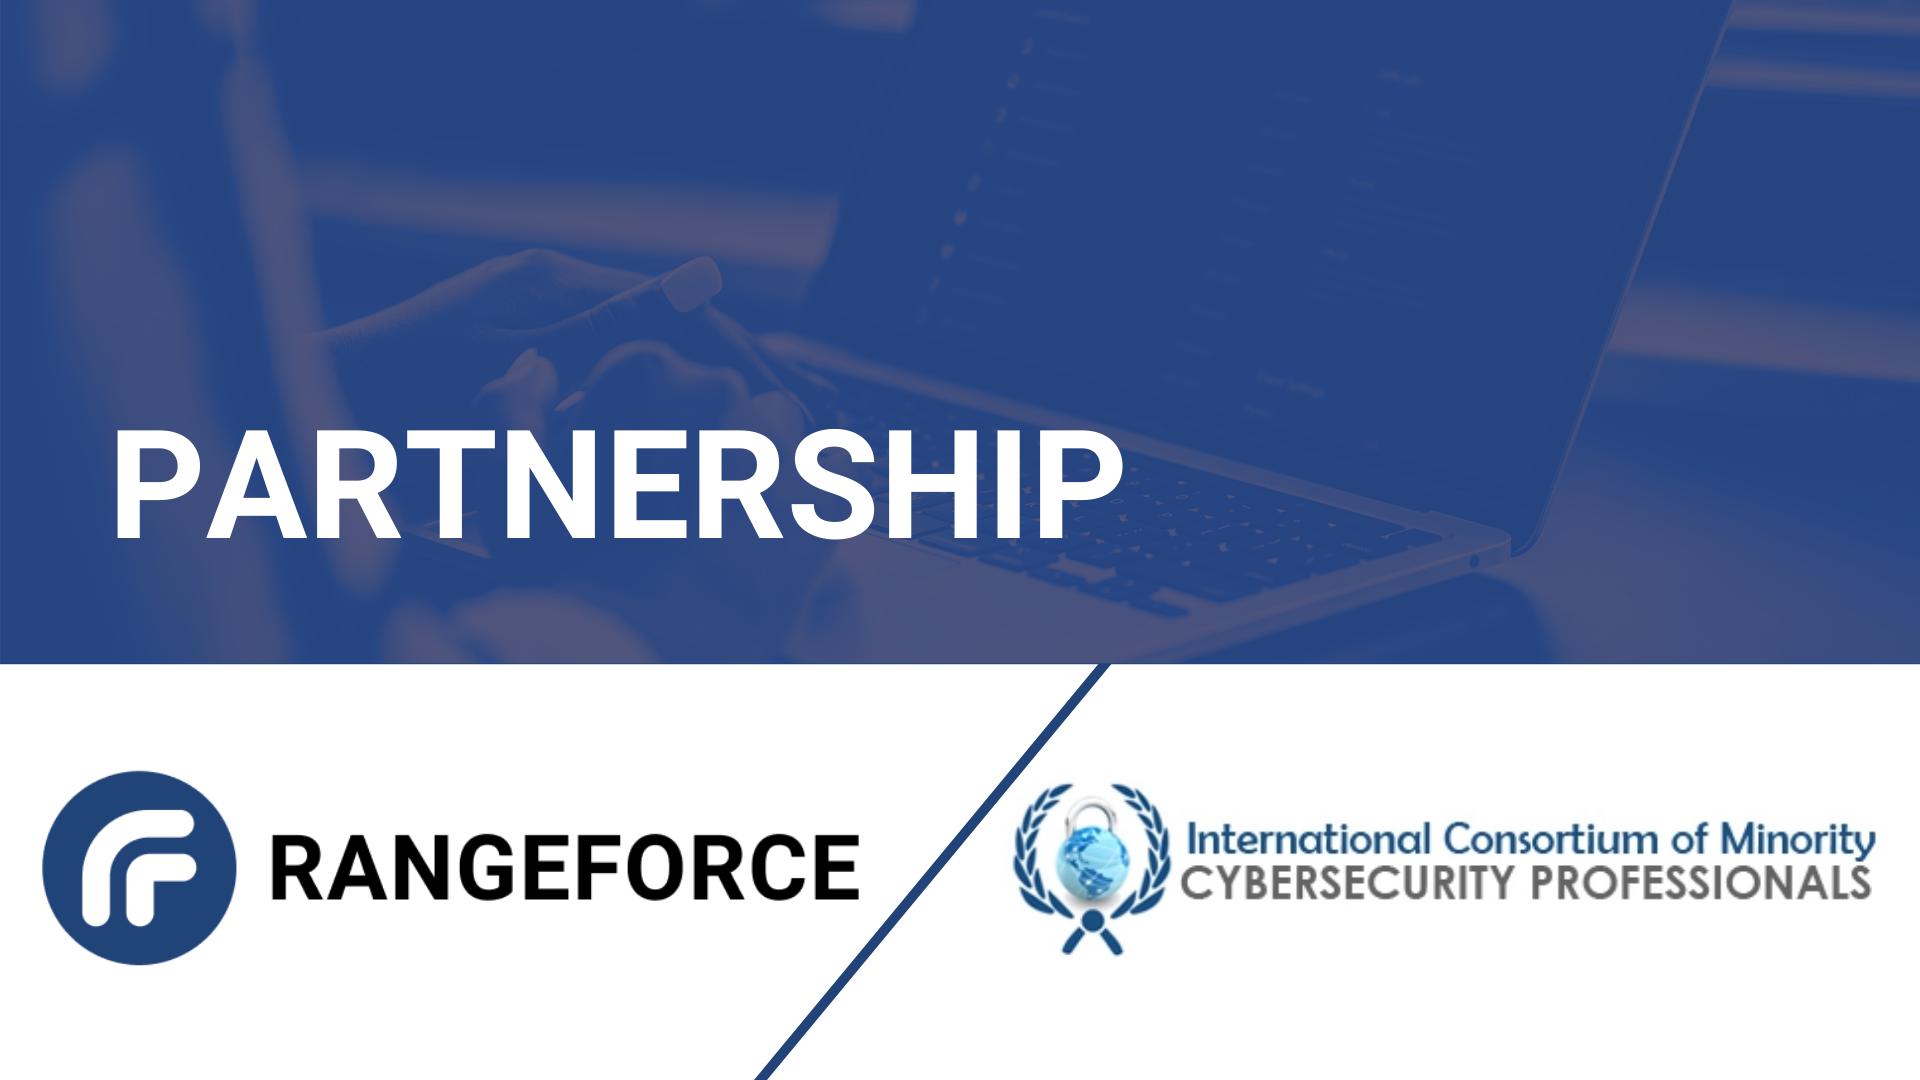 RangeForce Announces Training Partnership with International Consortium of Minority Cyber Professionals